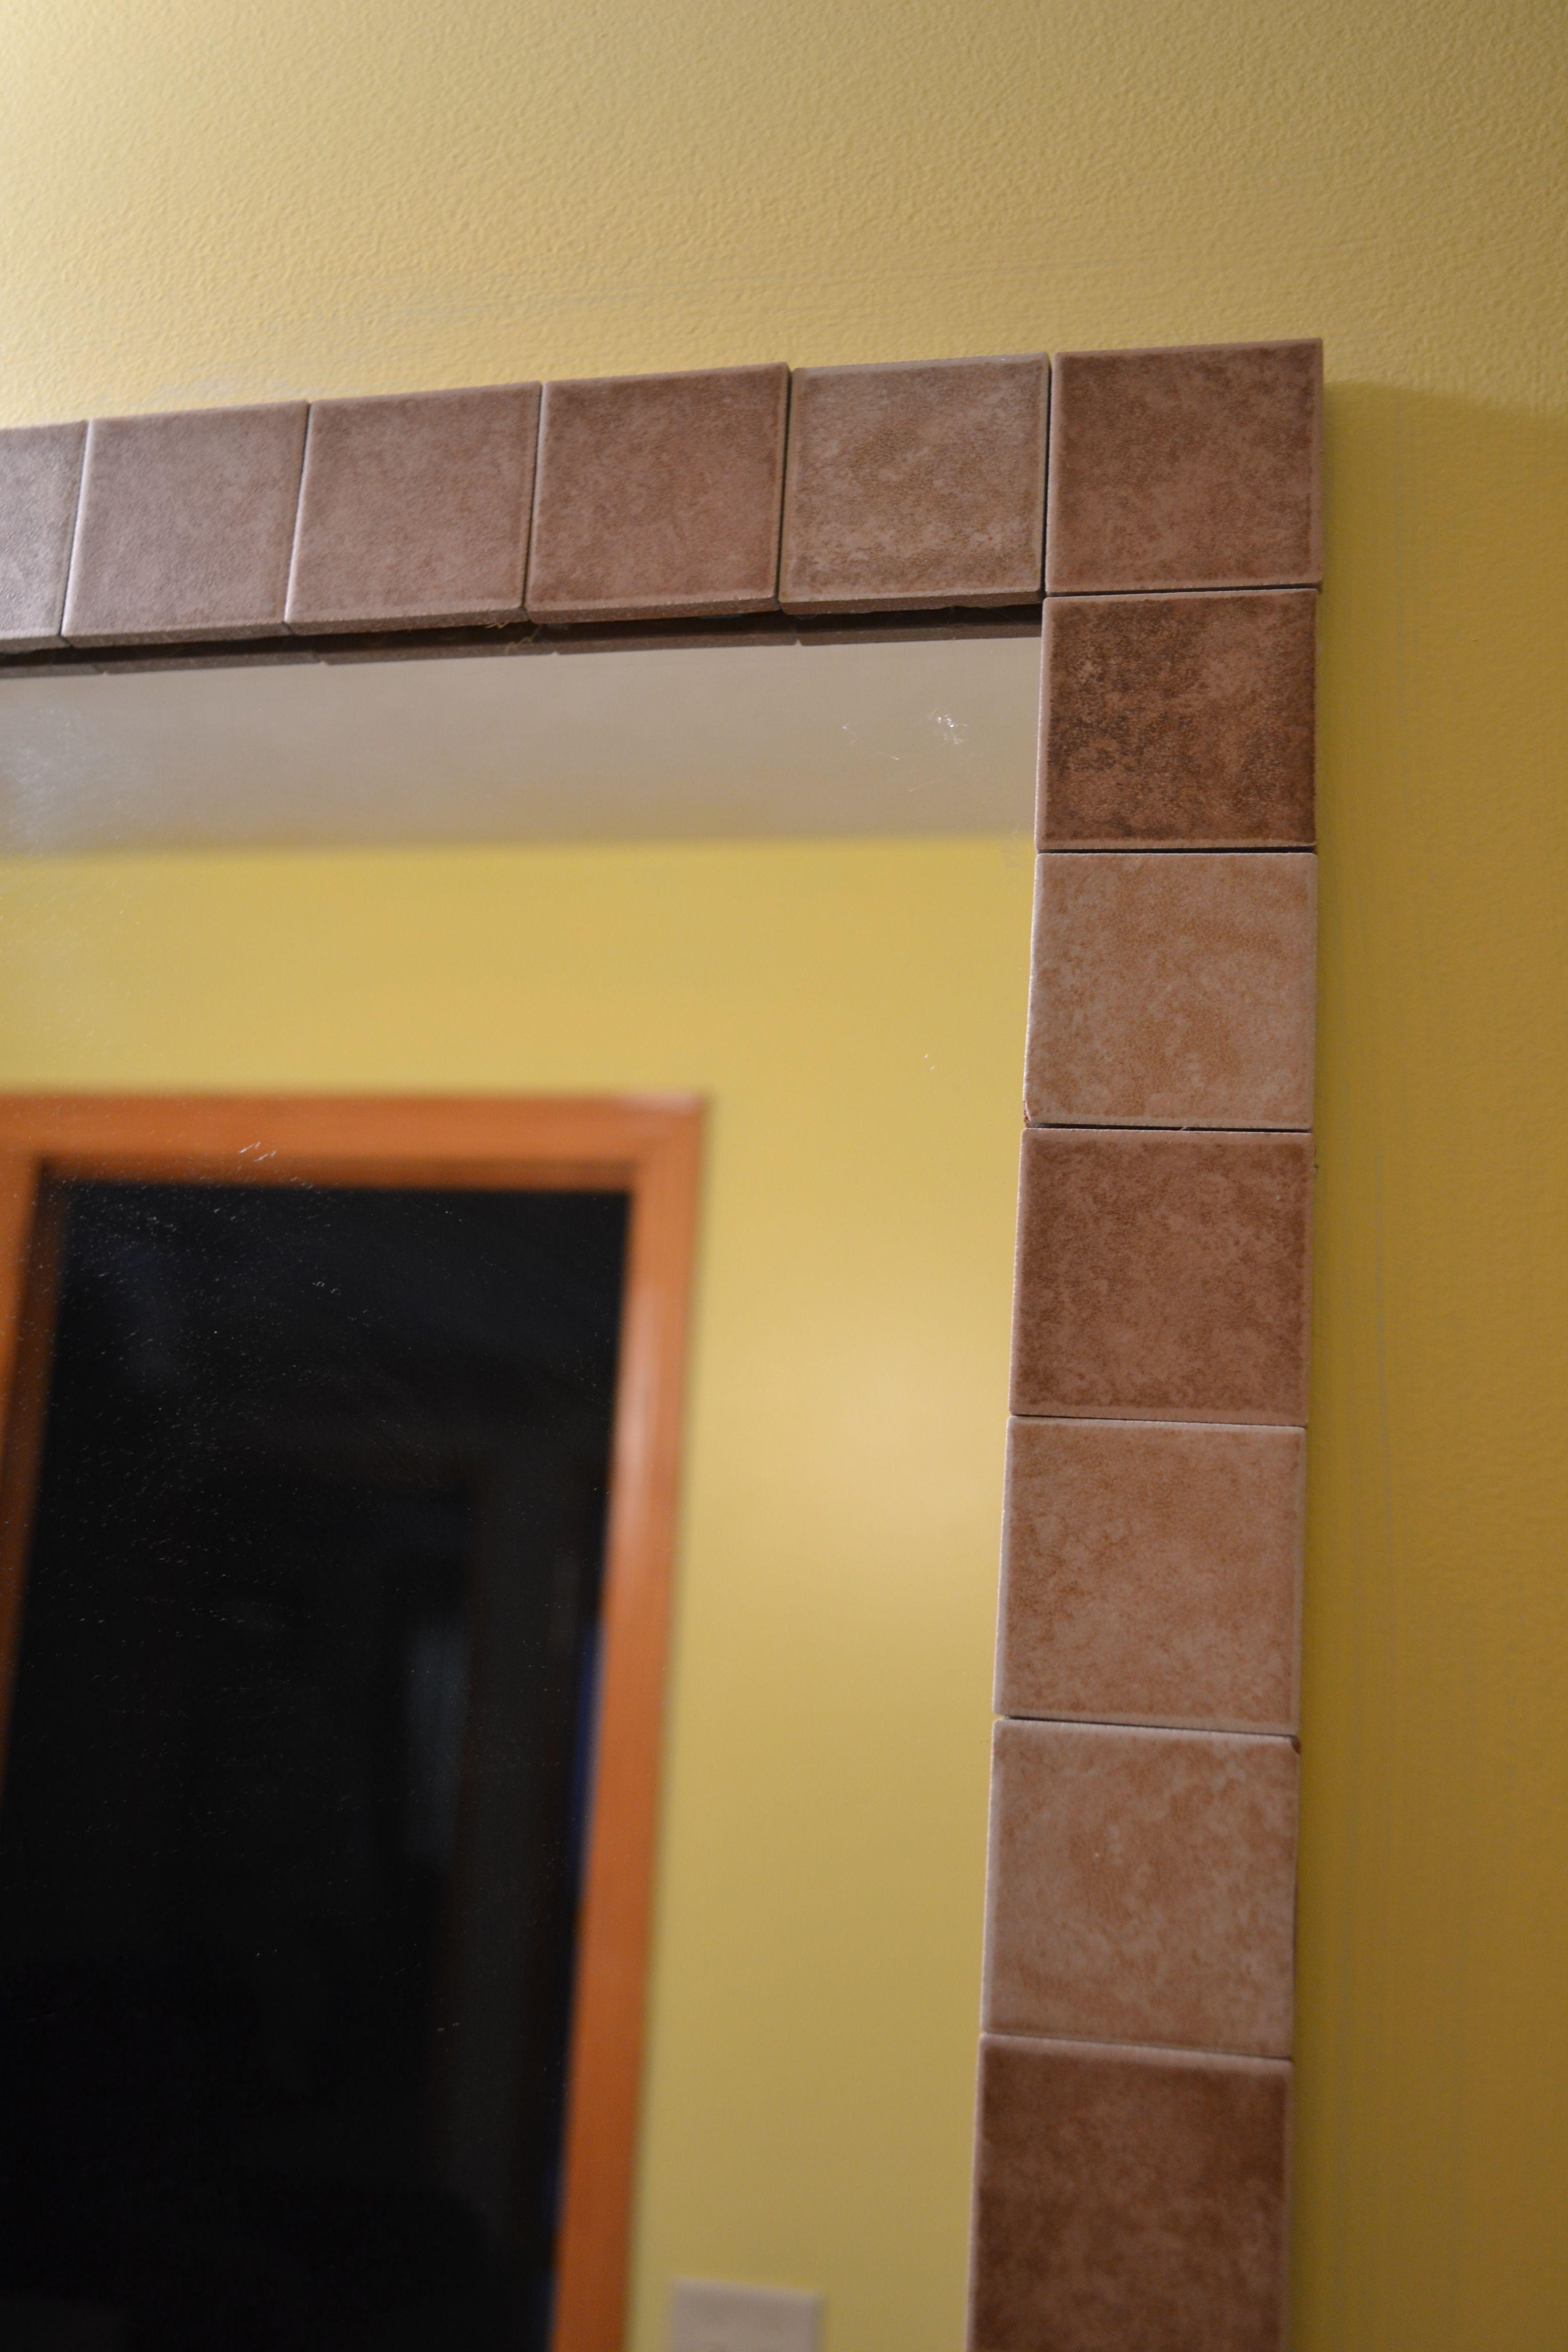 Bathroom Mirror Cost tile border around a standard bathroom mirror. so easy and very